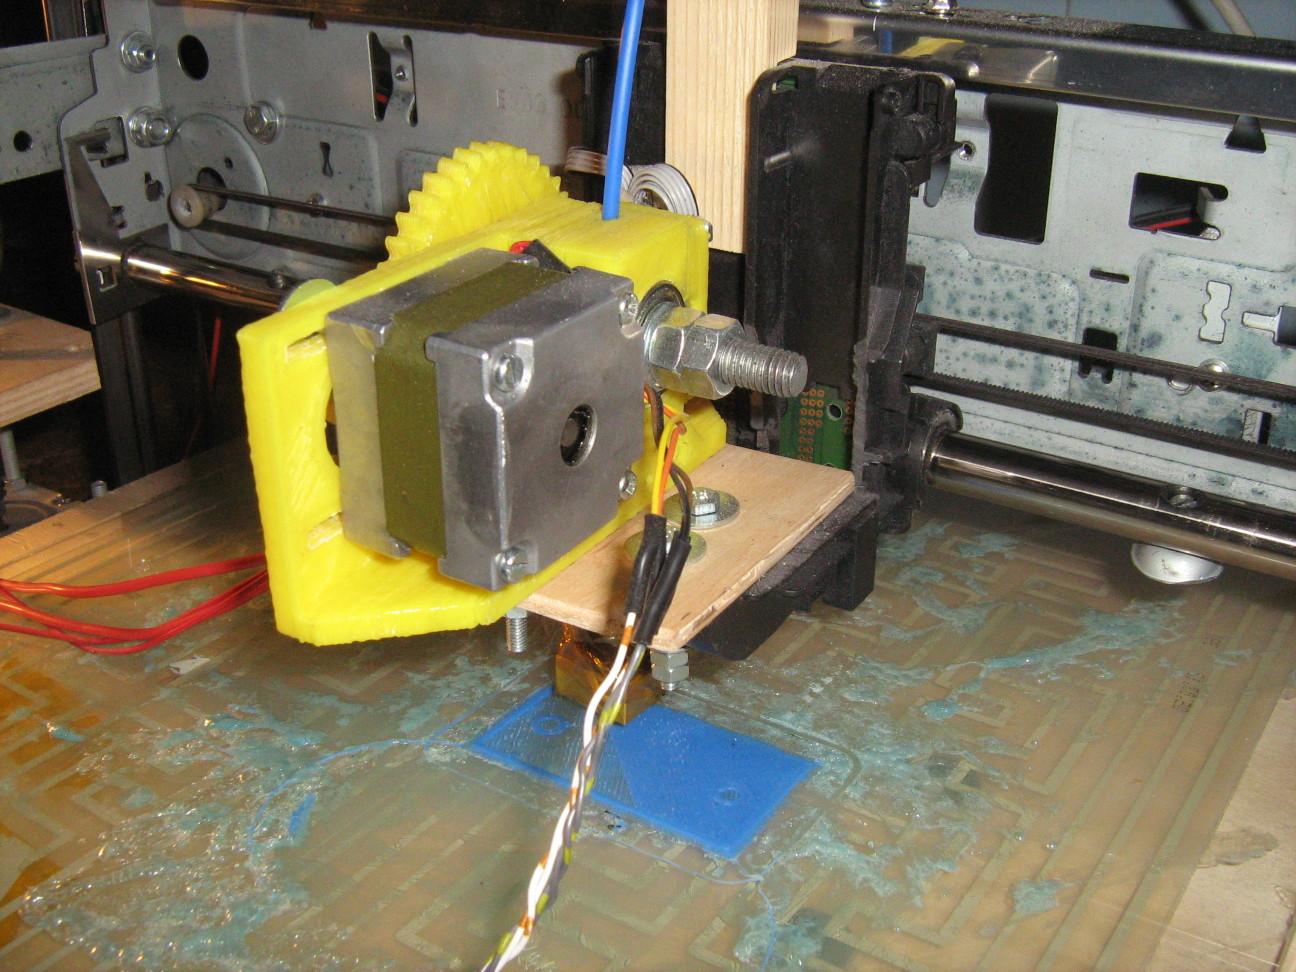 3D nyomtatófej régi floppimotorral